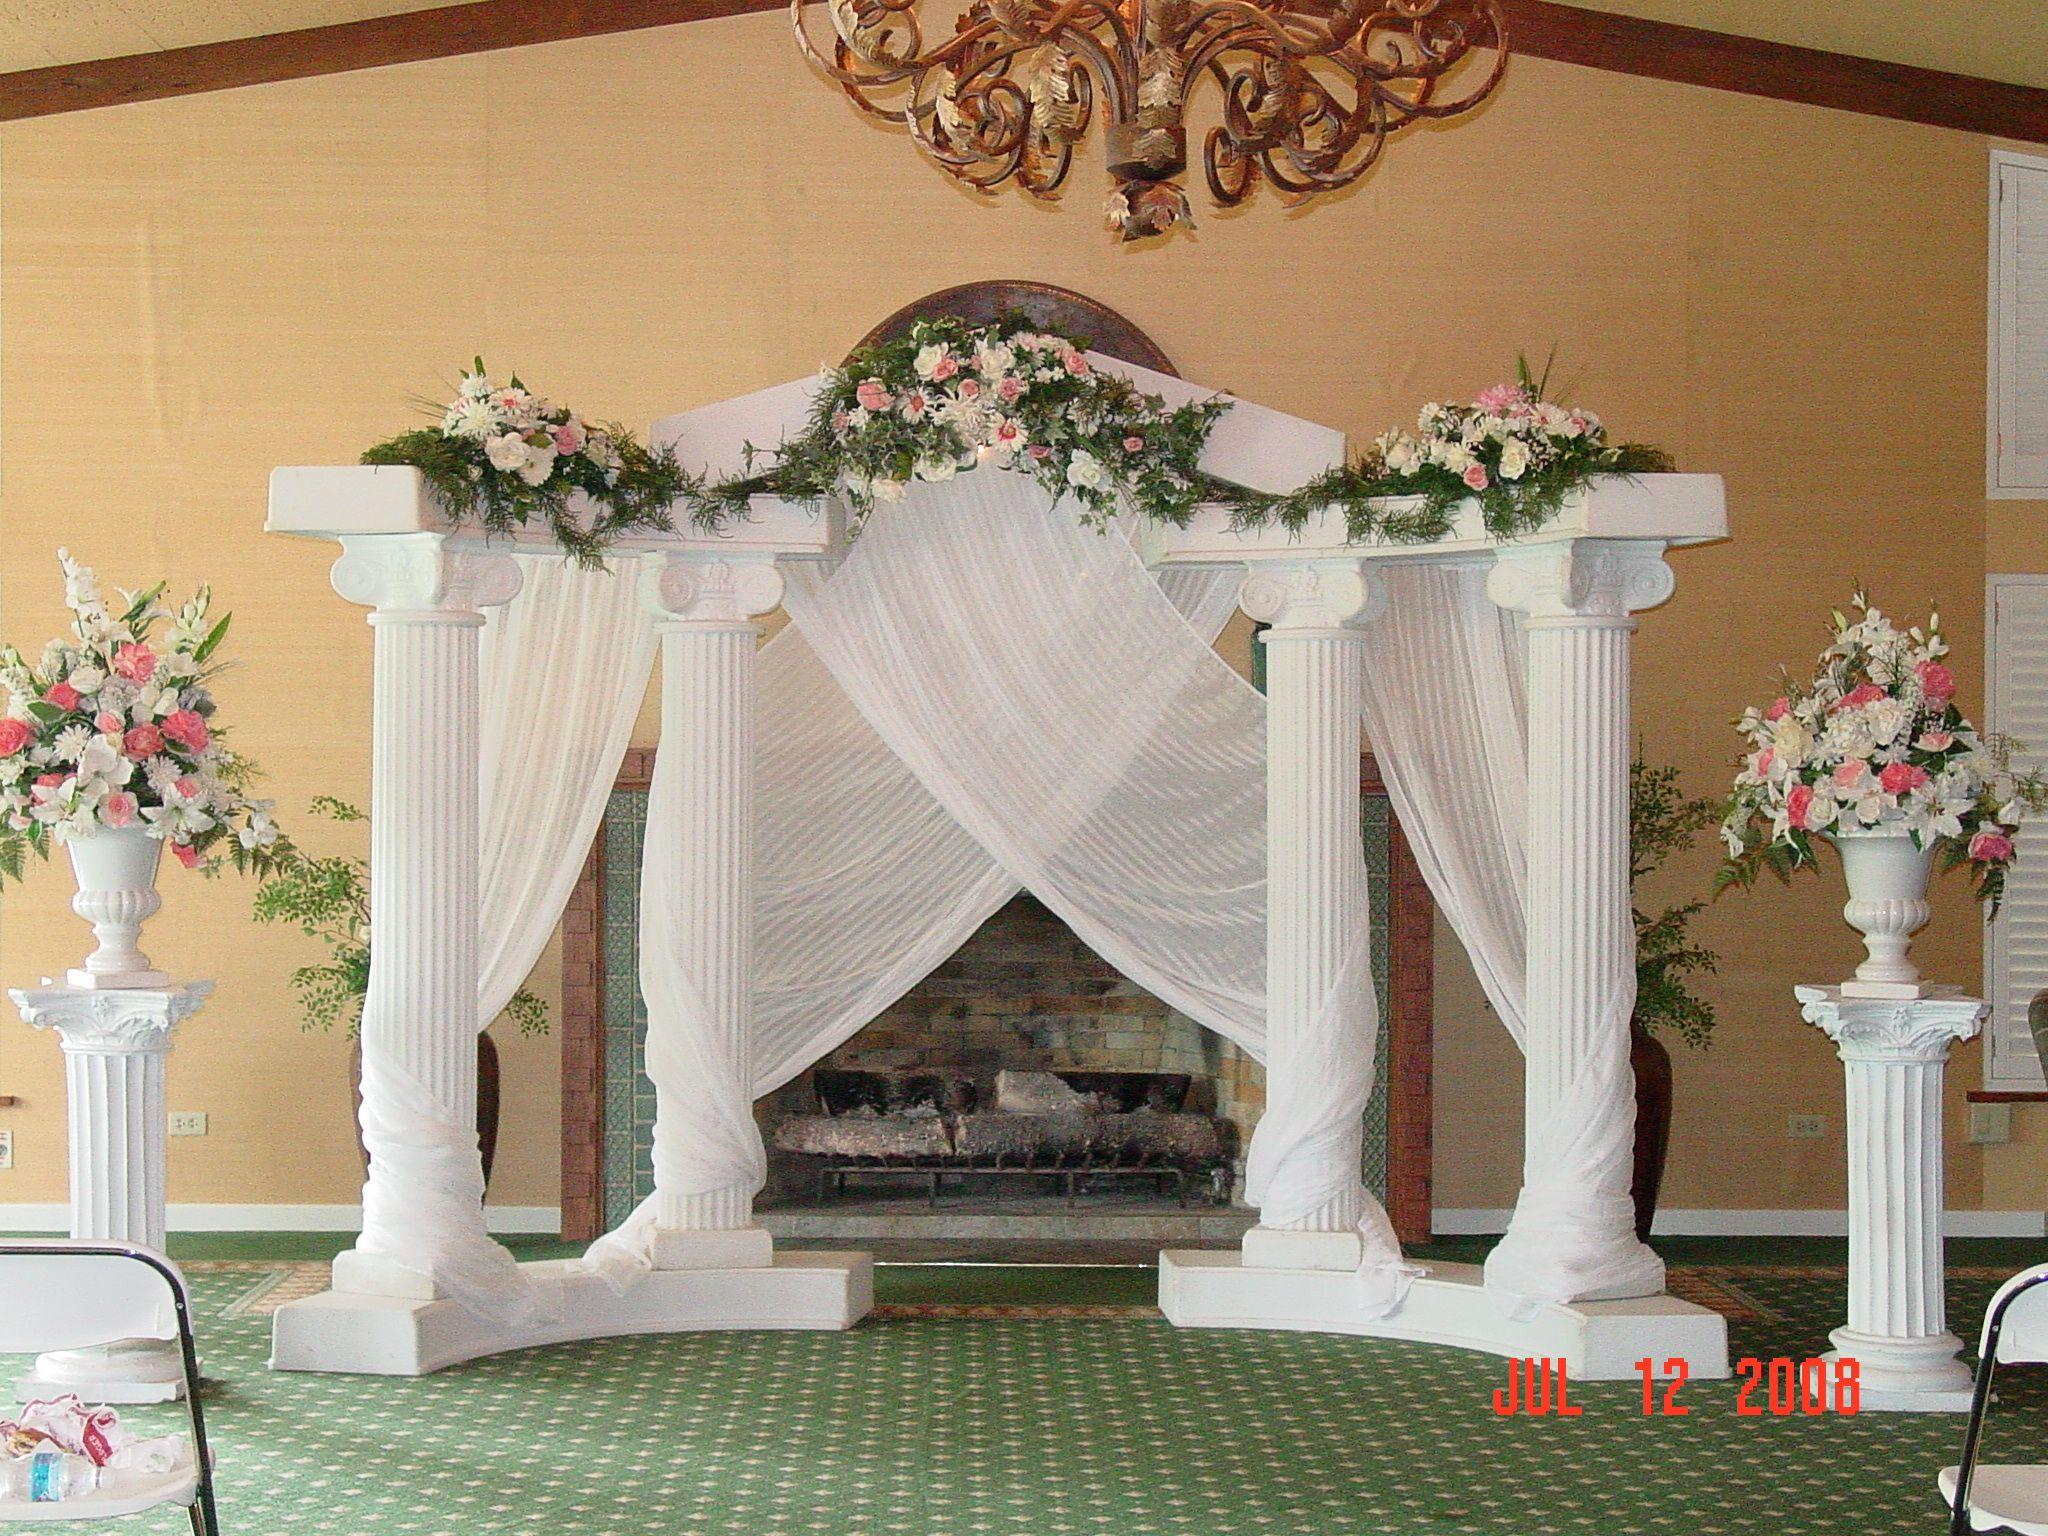 Wedding Ceremony Backdrop Wedding Ceremony Decorations Indoor Indoor Wedding Ceremonies Wedding Ceremony Decorations